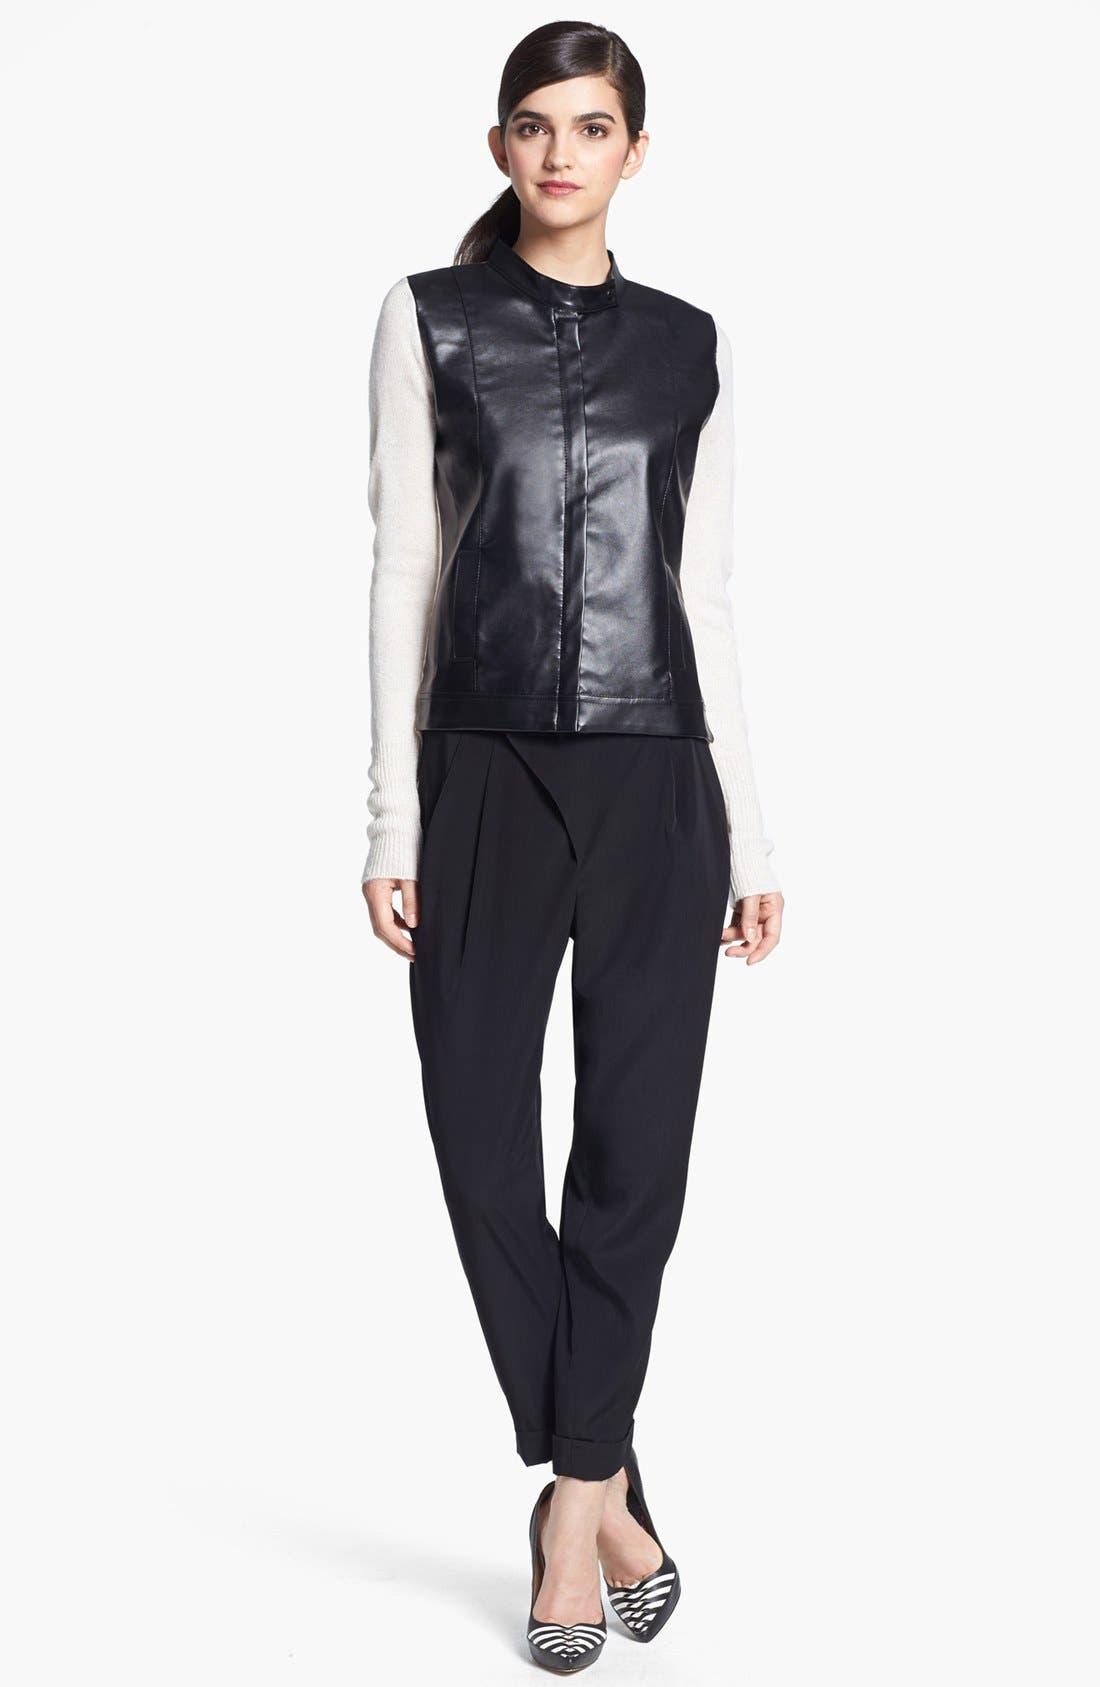 Alternate Image 1 Selected - Robbi & Nikki Faux Leather Detail Moto Cardigan